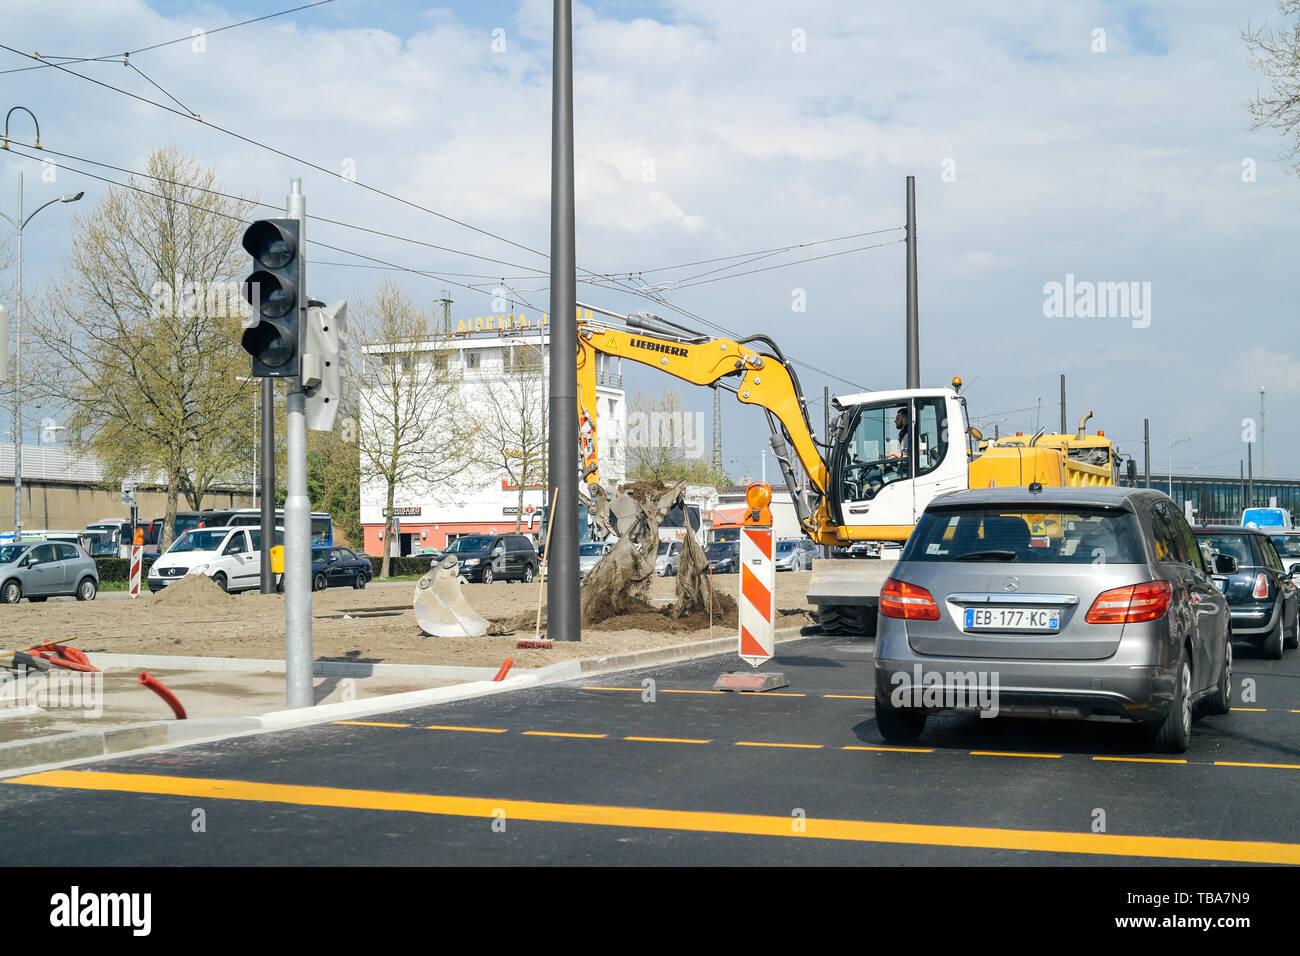 Kehl, Germany - Apr 4, 2017: Liebherr excavator working on roadworks installing new tramway rail in central German Kehl city Stock Photo